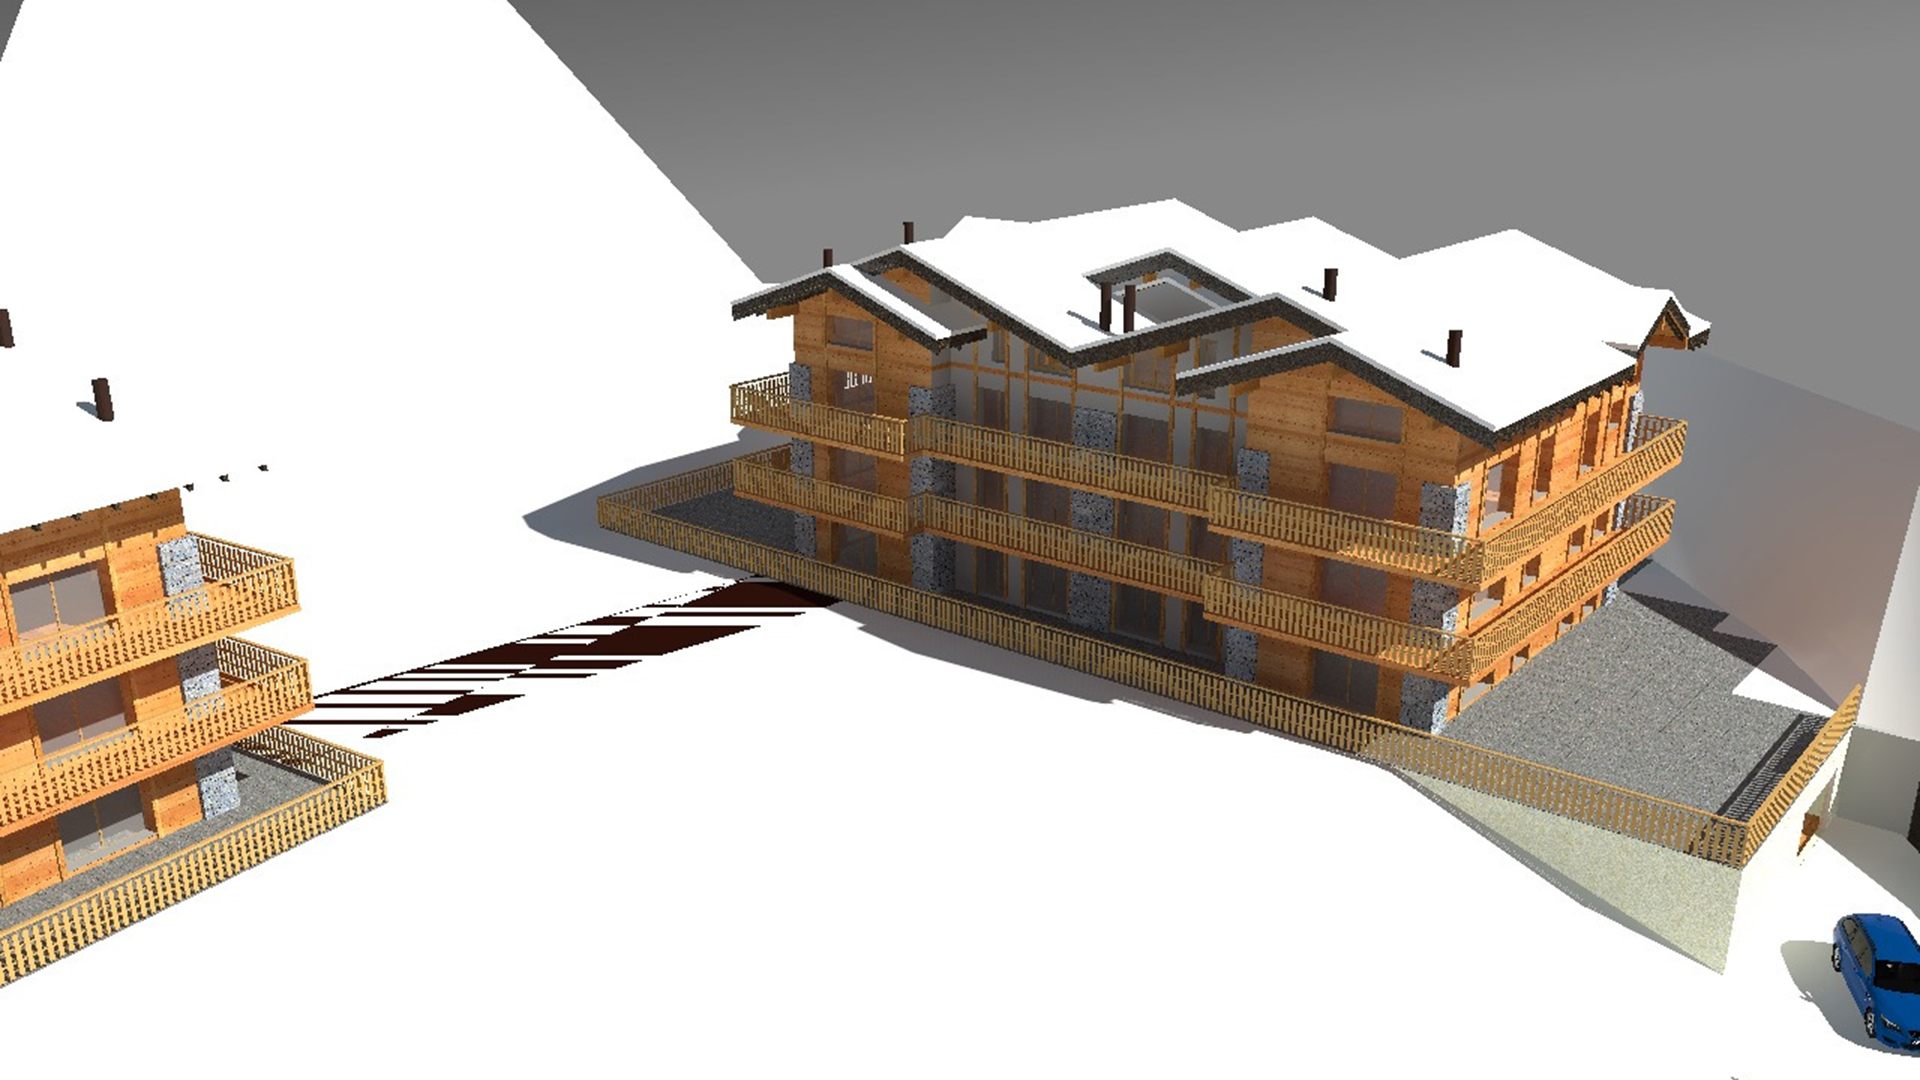 Etoile des Pistes Apartments, Switzerland